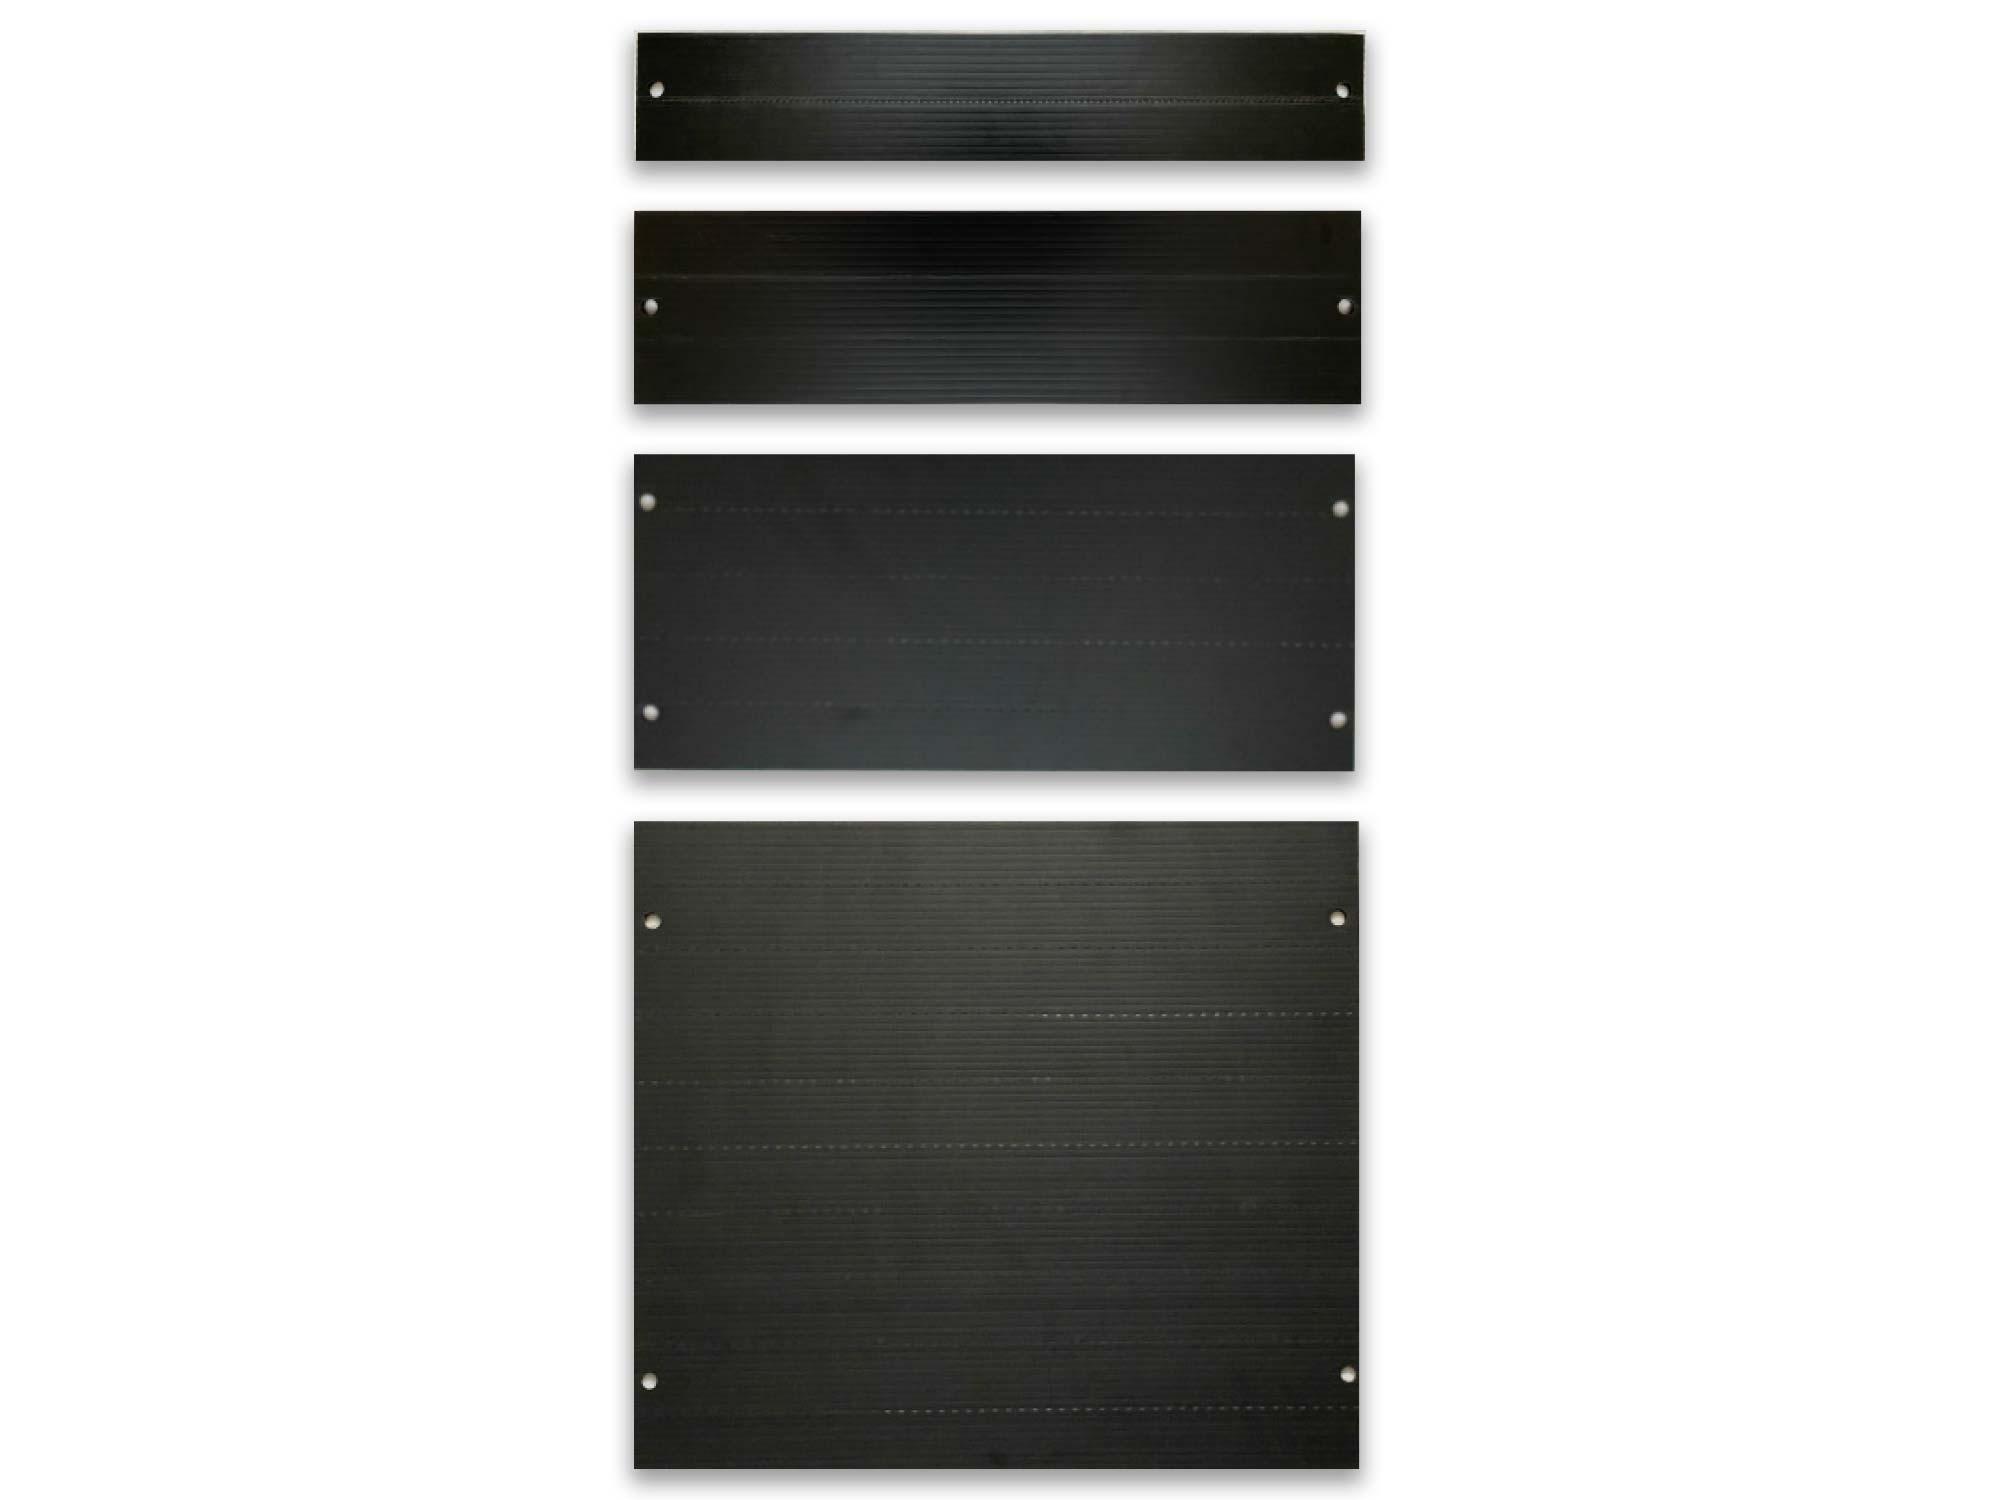 Rackfill individual blanking panels